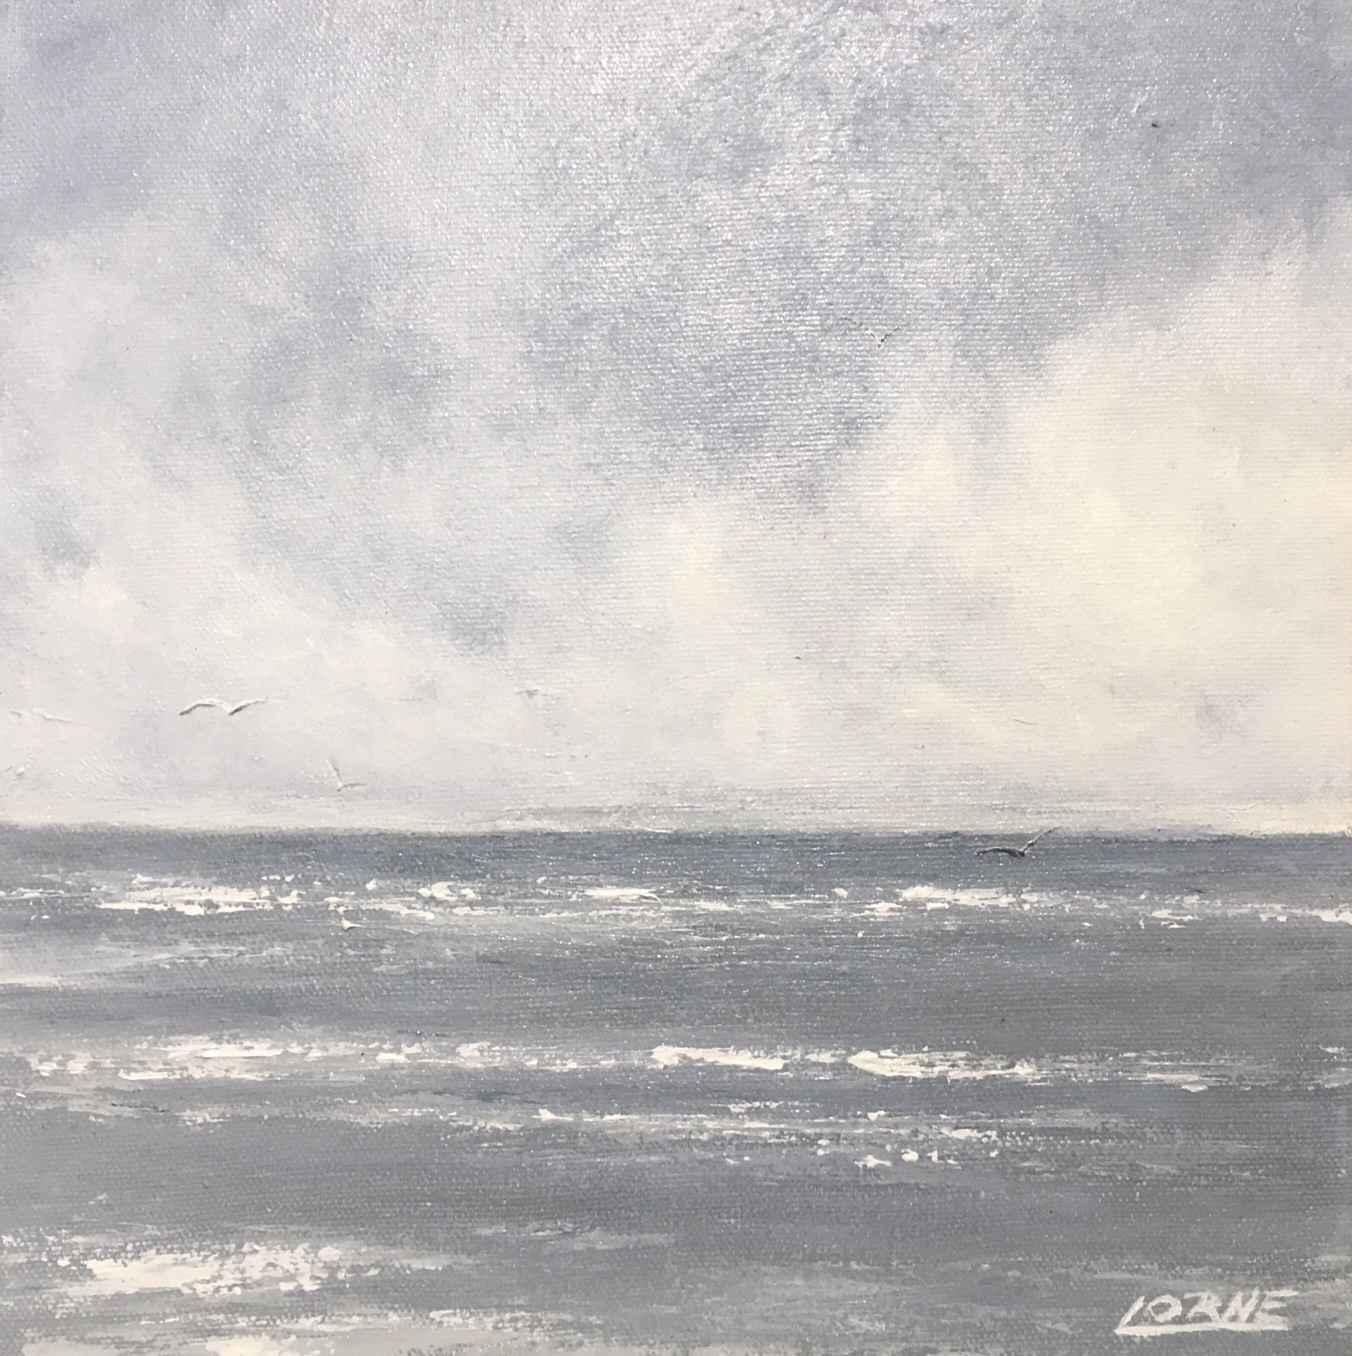 Espresso On the Bay IV by Mr. Lorne McDermott - Masterpiece Online